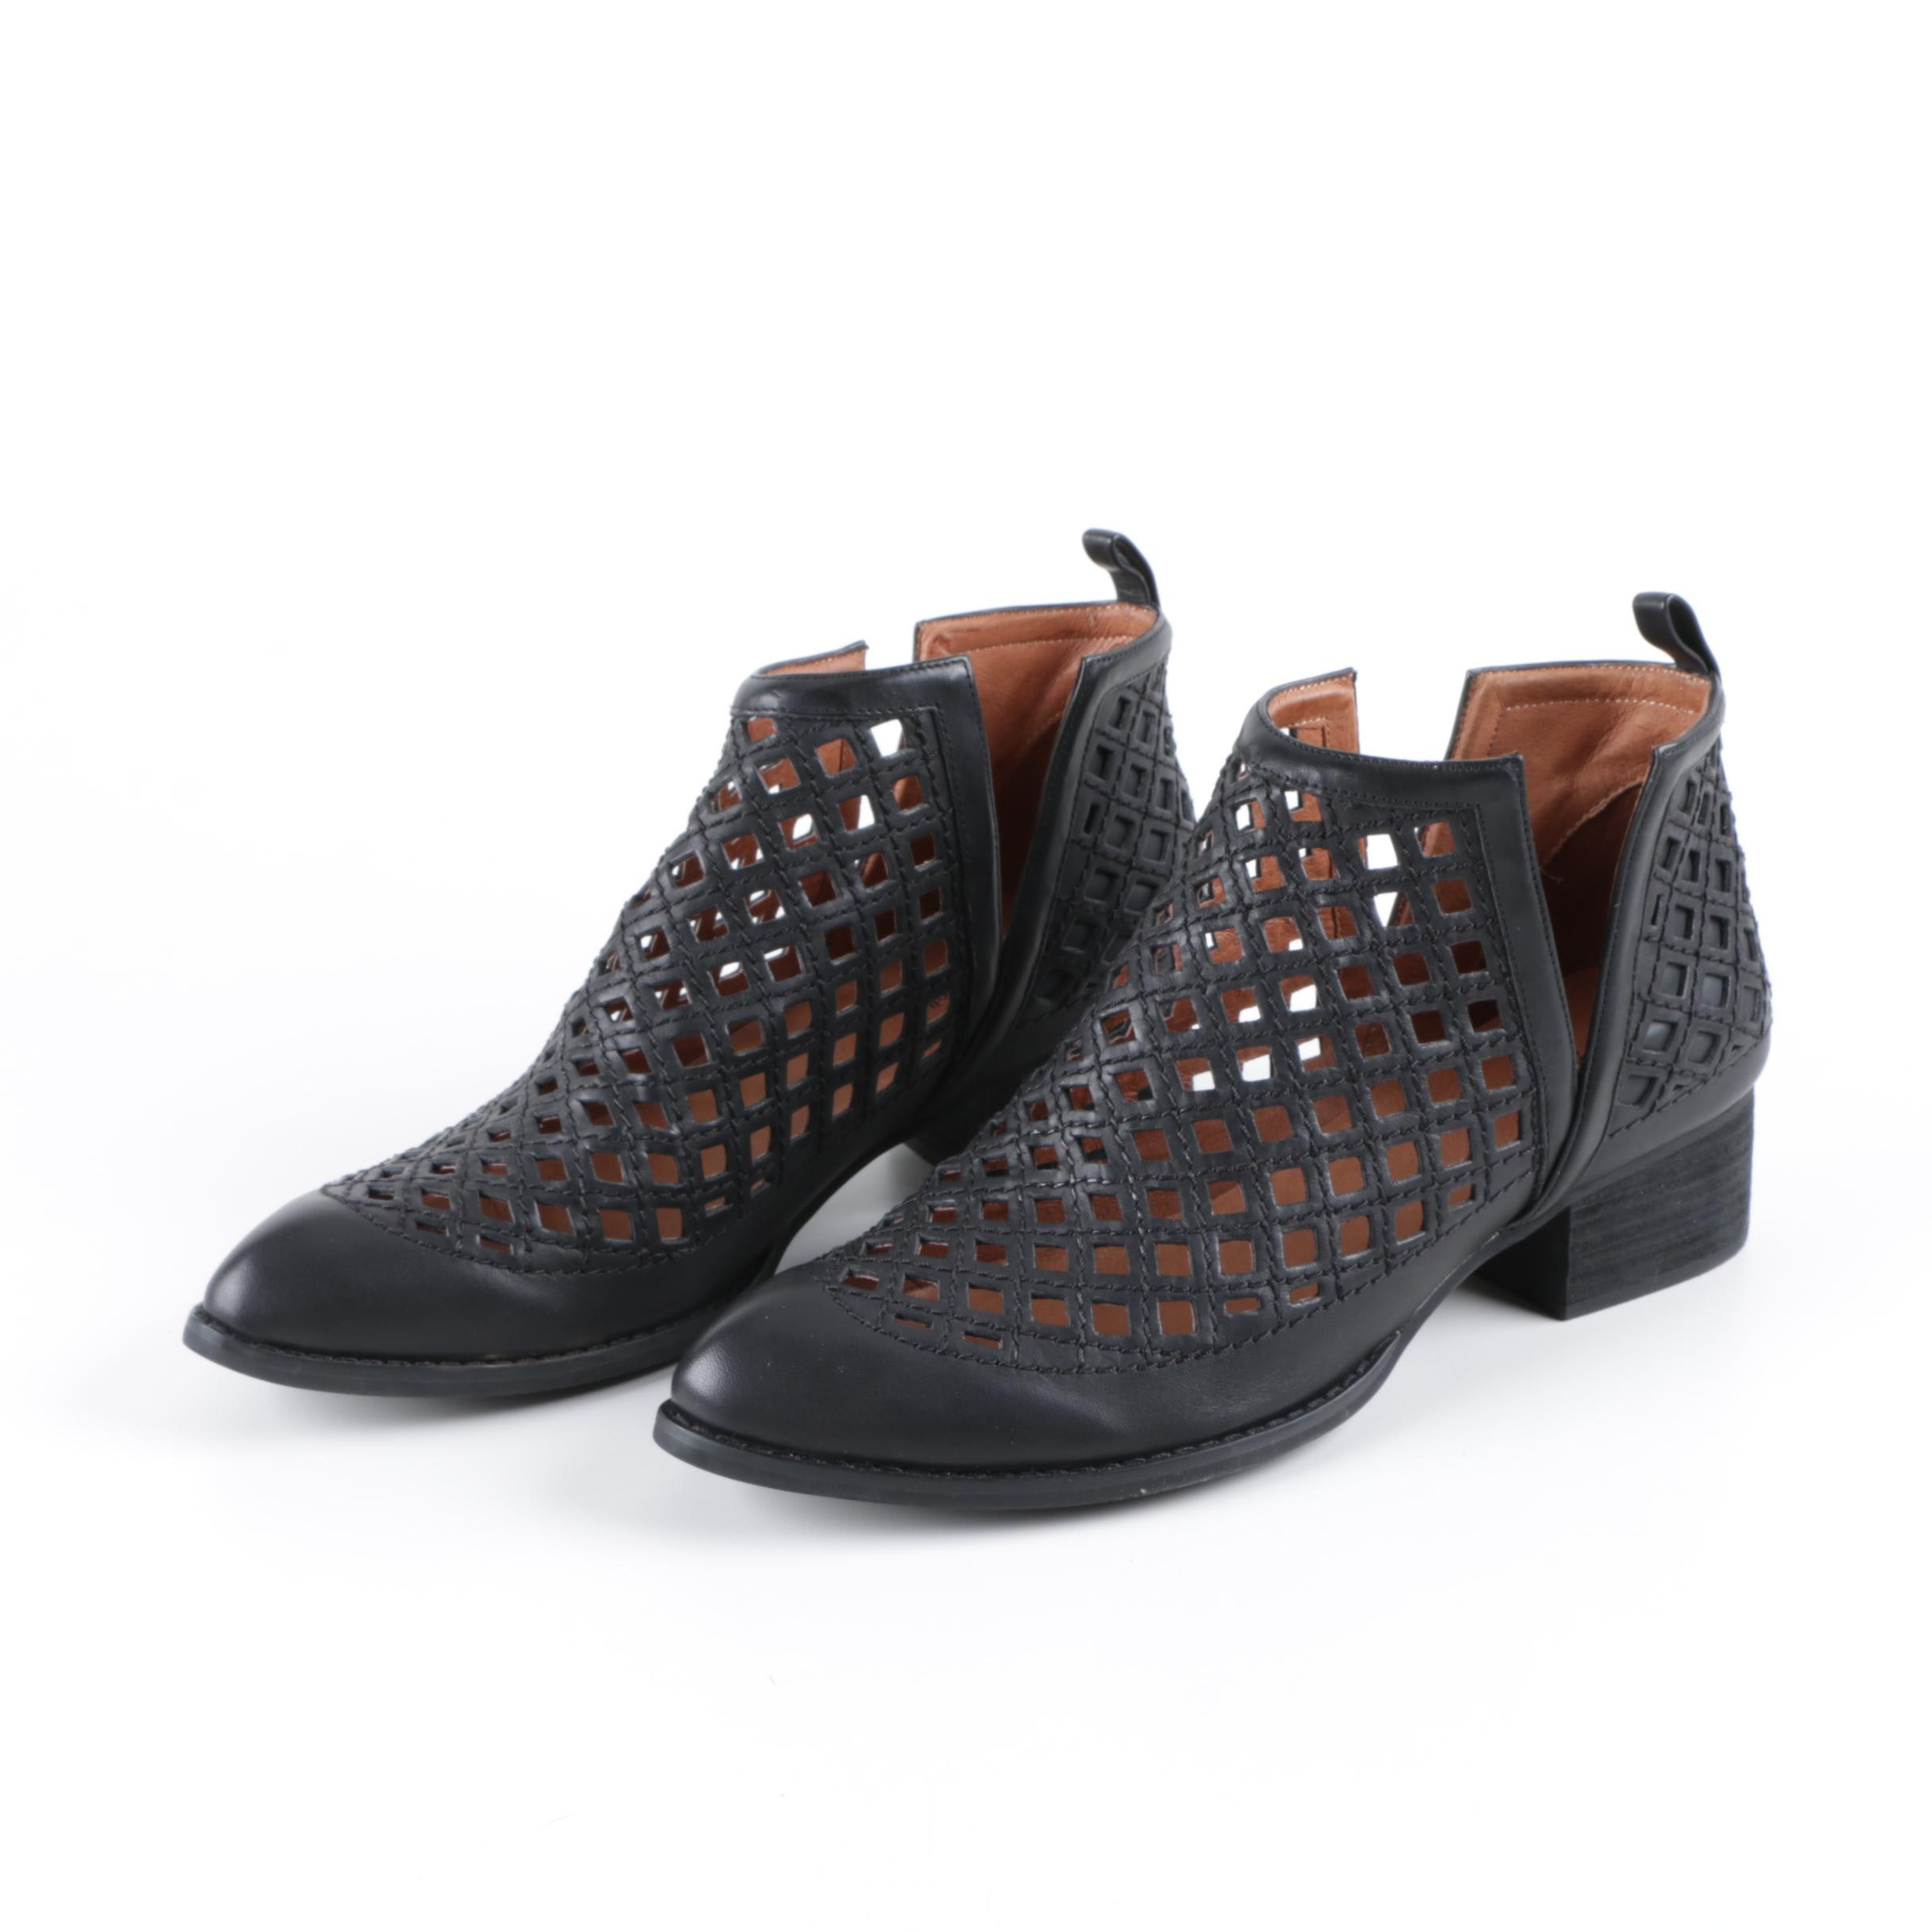 Jeffery Campbell Taggart Black Latticework Ankle Boots